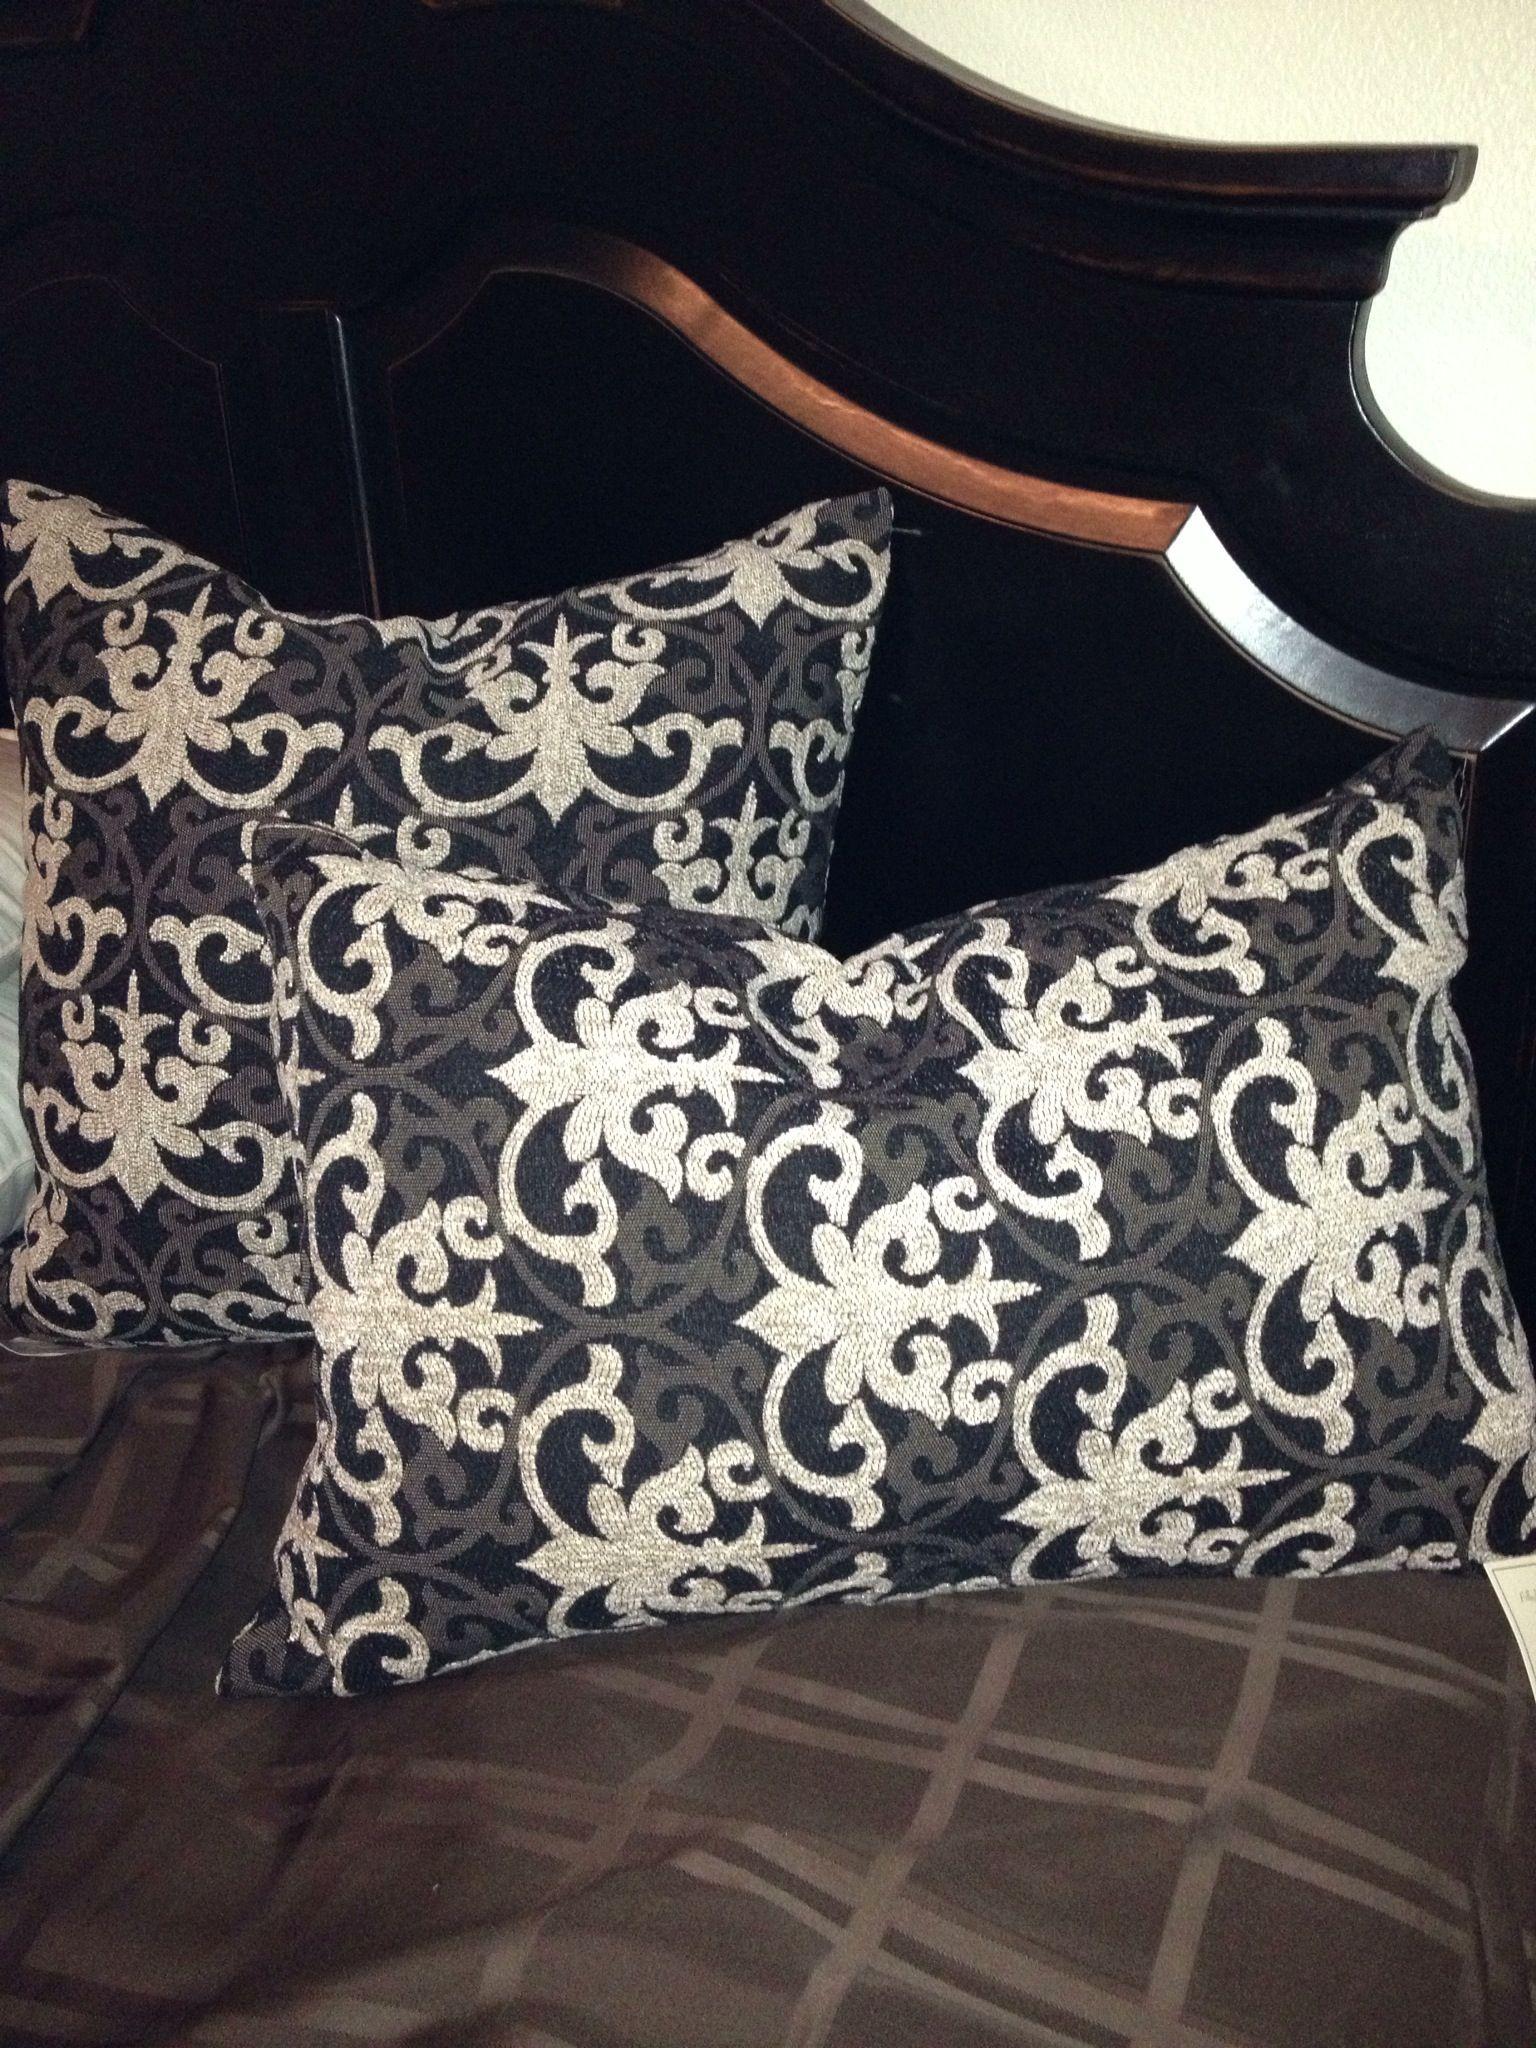 Throw pillows available at Sublime Decor